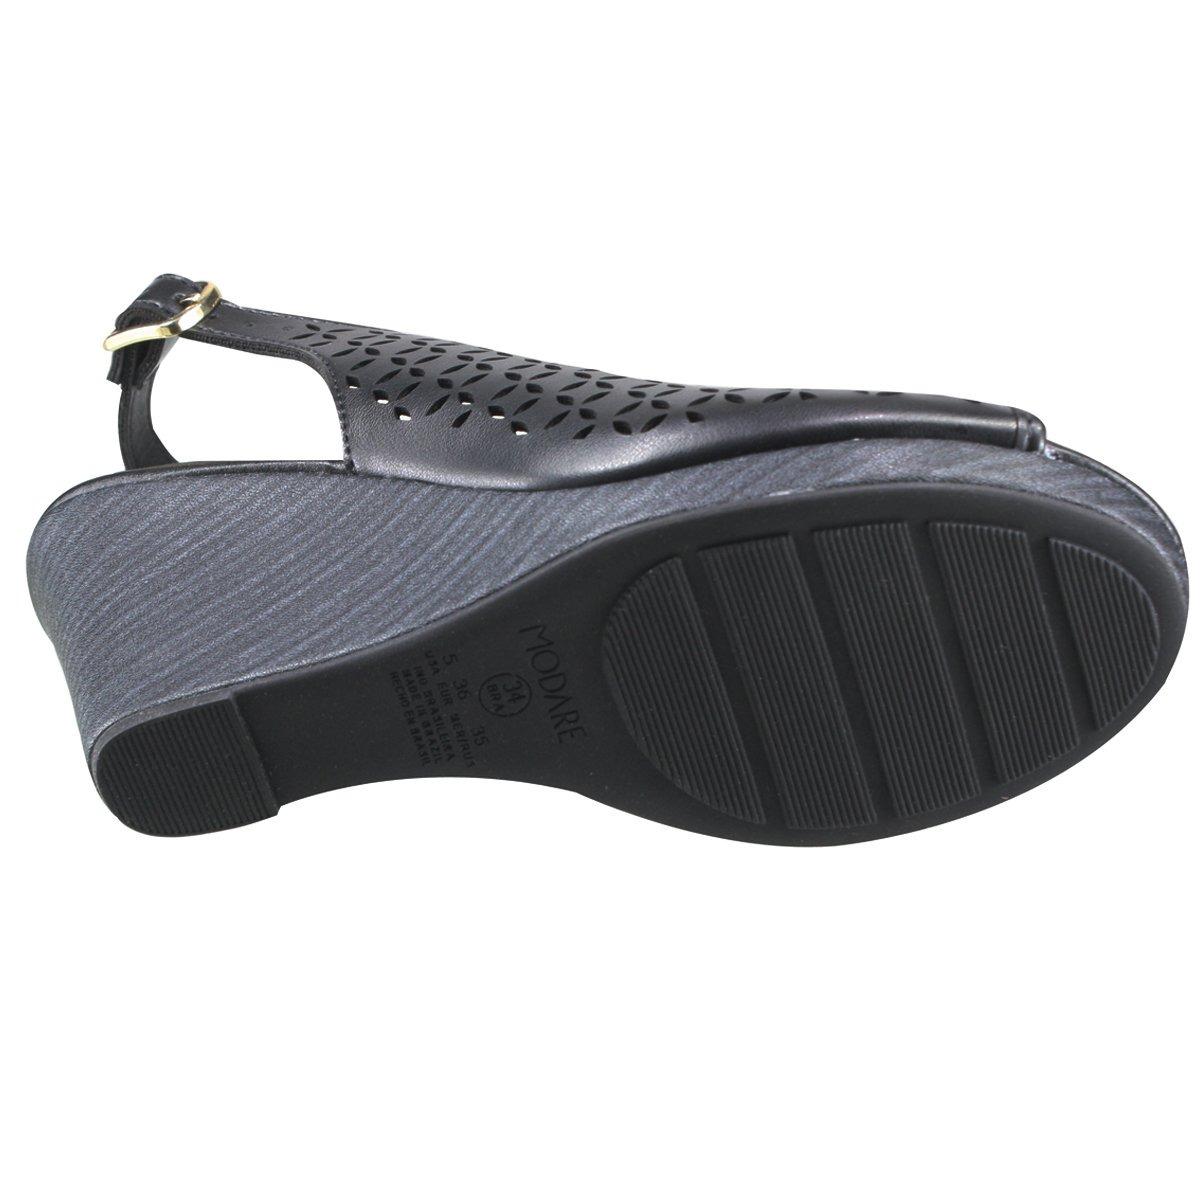 d29a7e86d3 sandália modare ultraconforto anabela 7101.323 5536 15745. Carregando zoom.